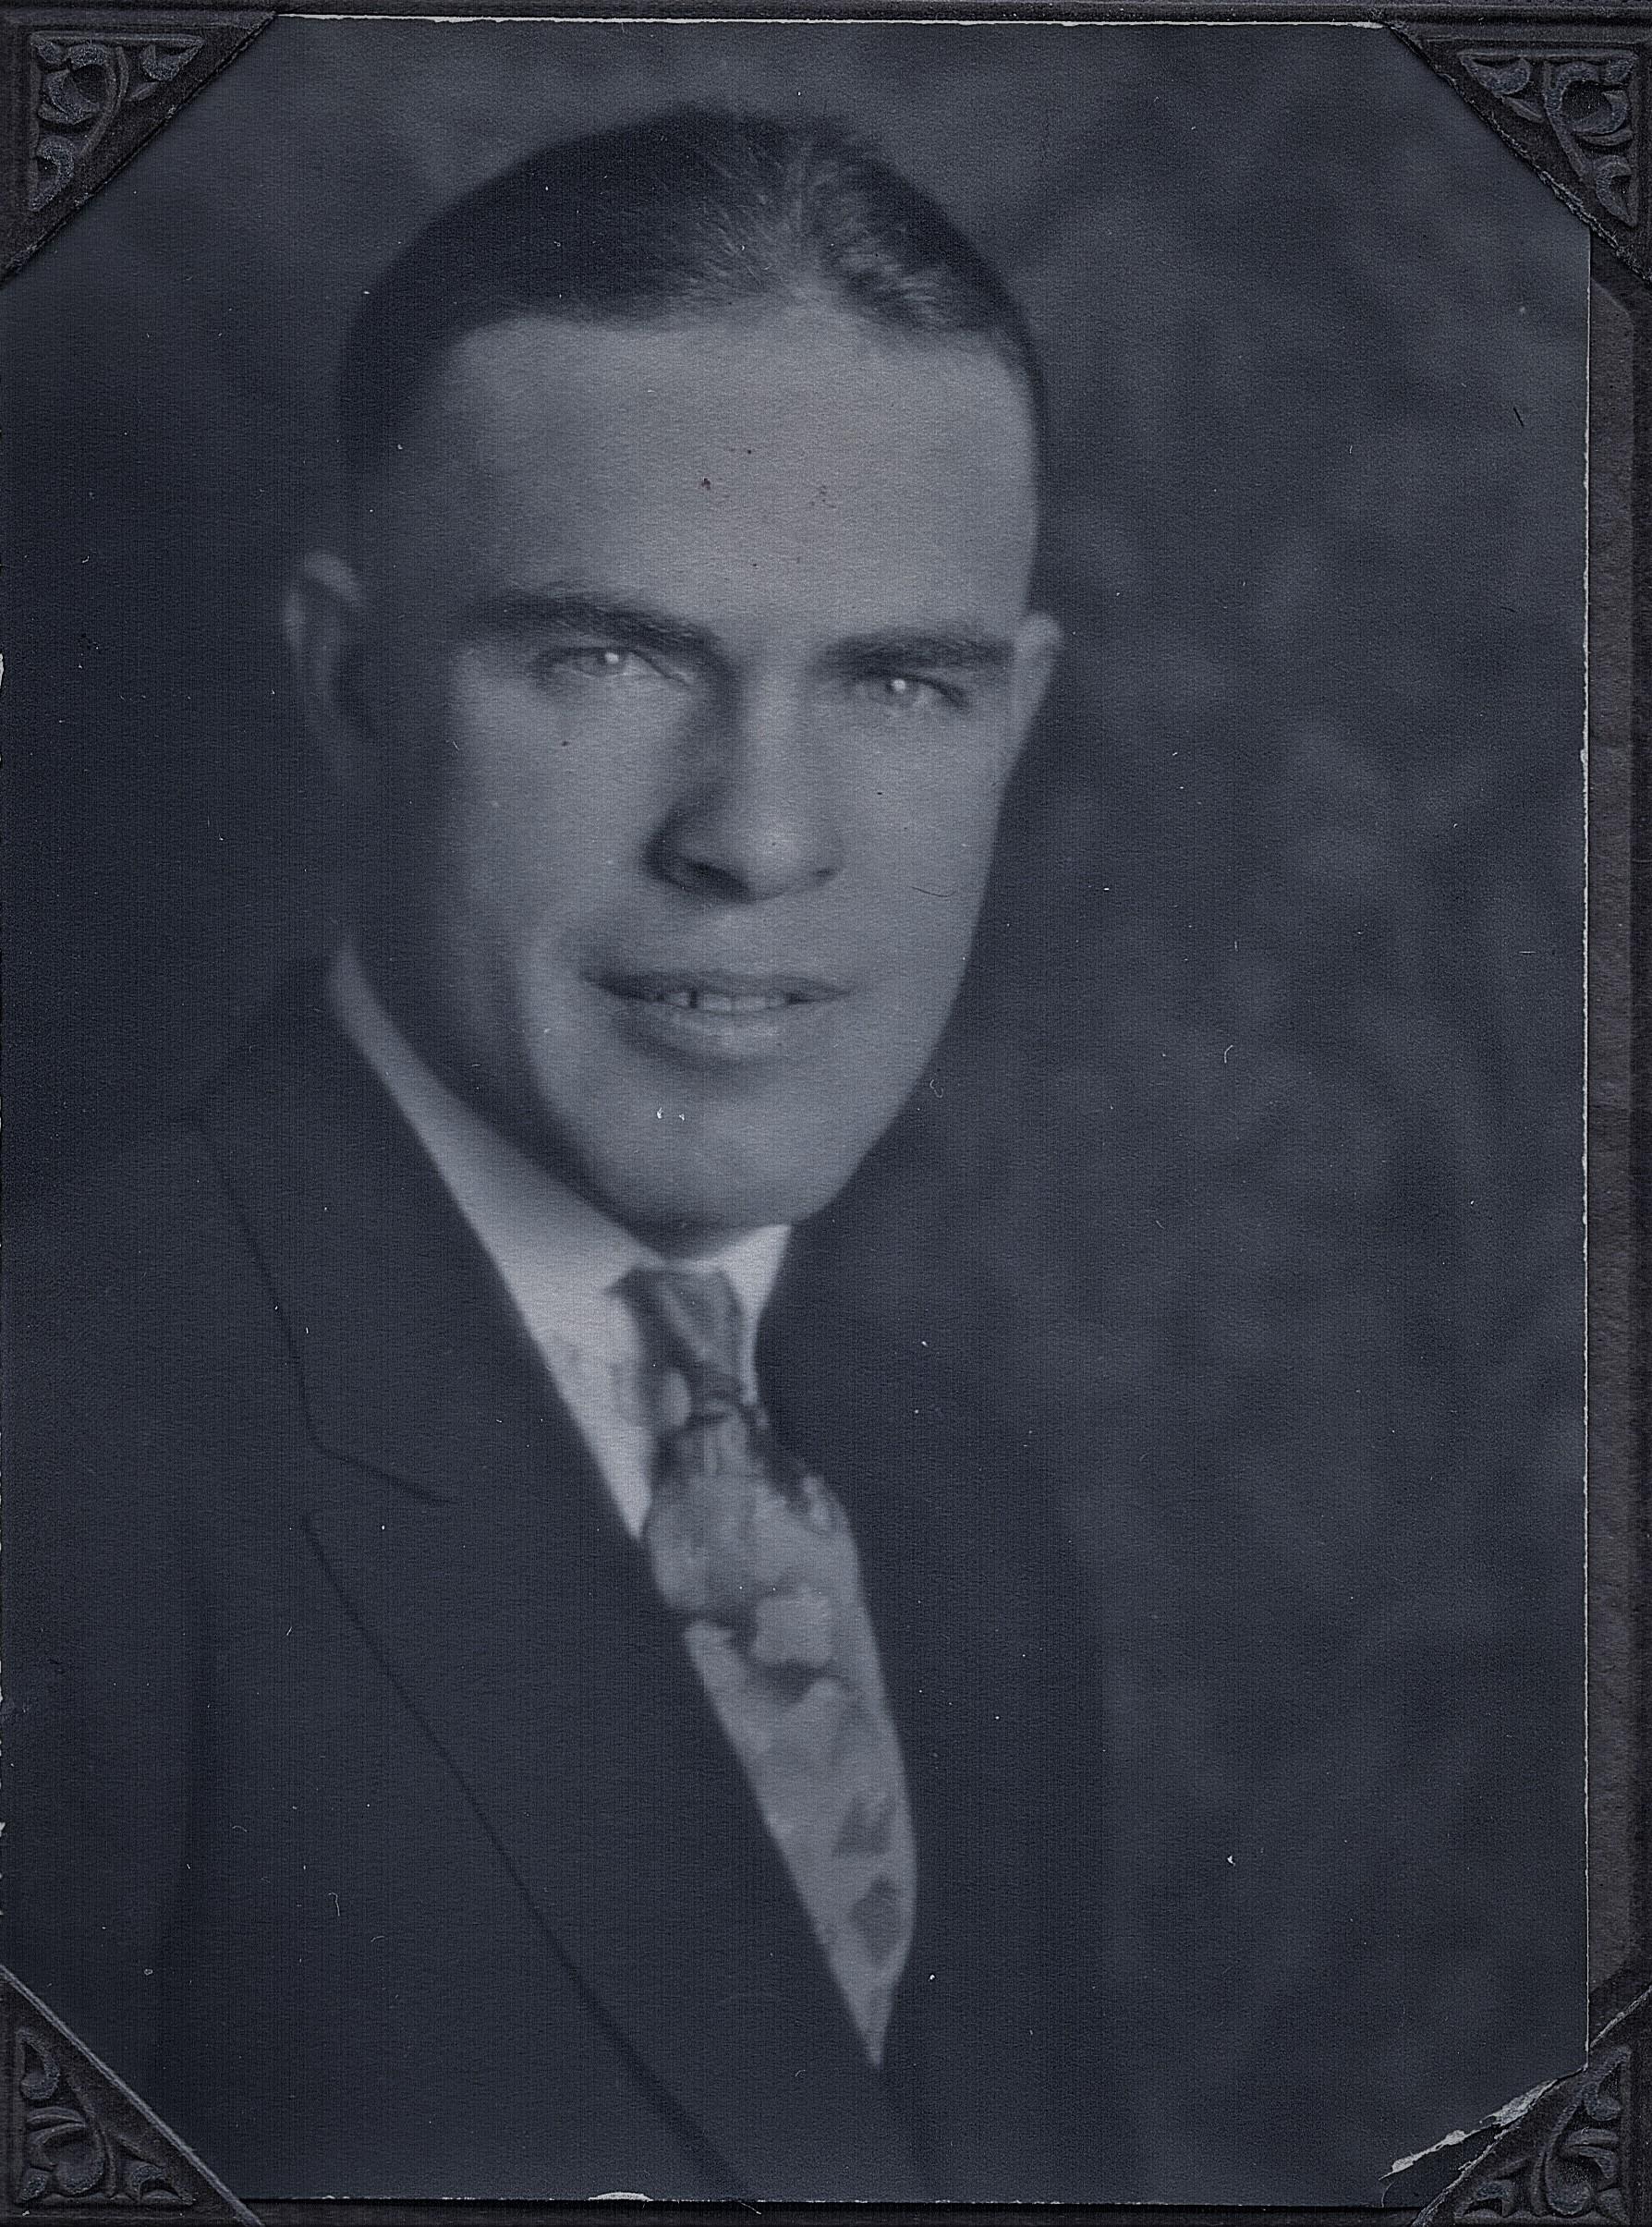 Brown, Cyril Devier